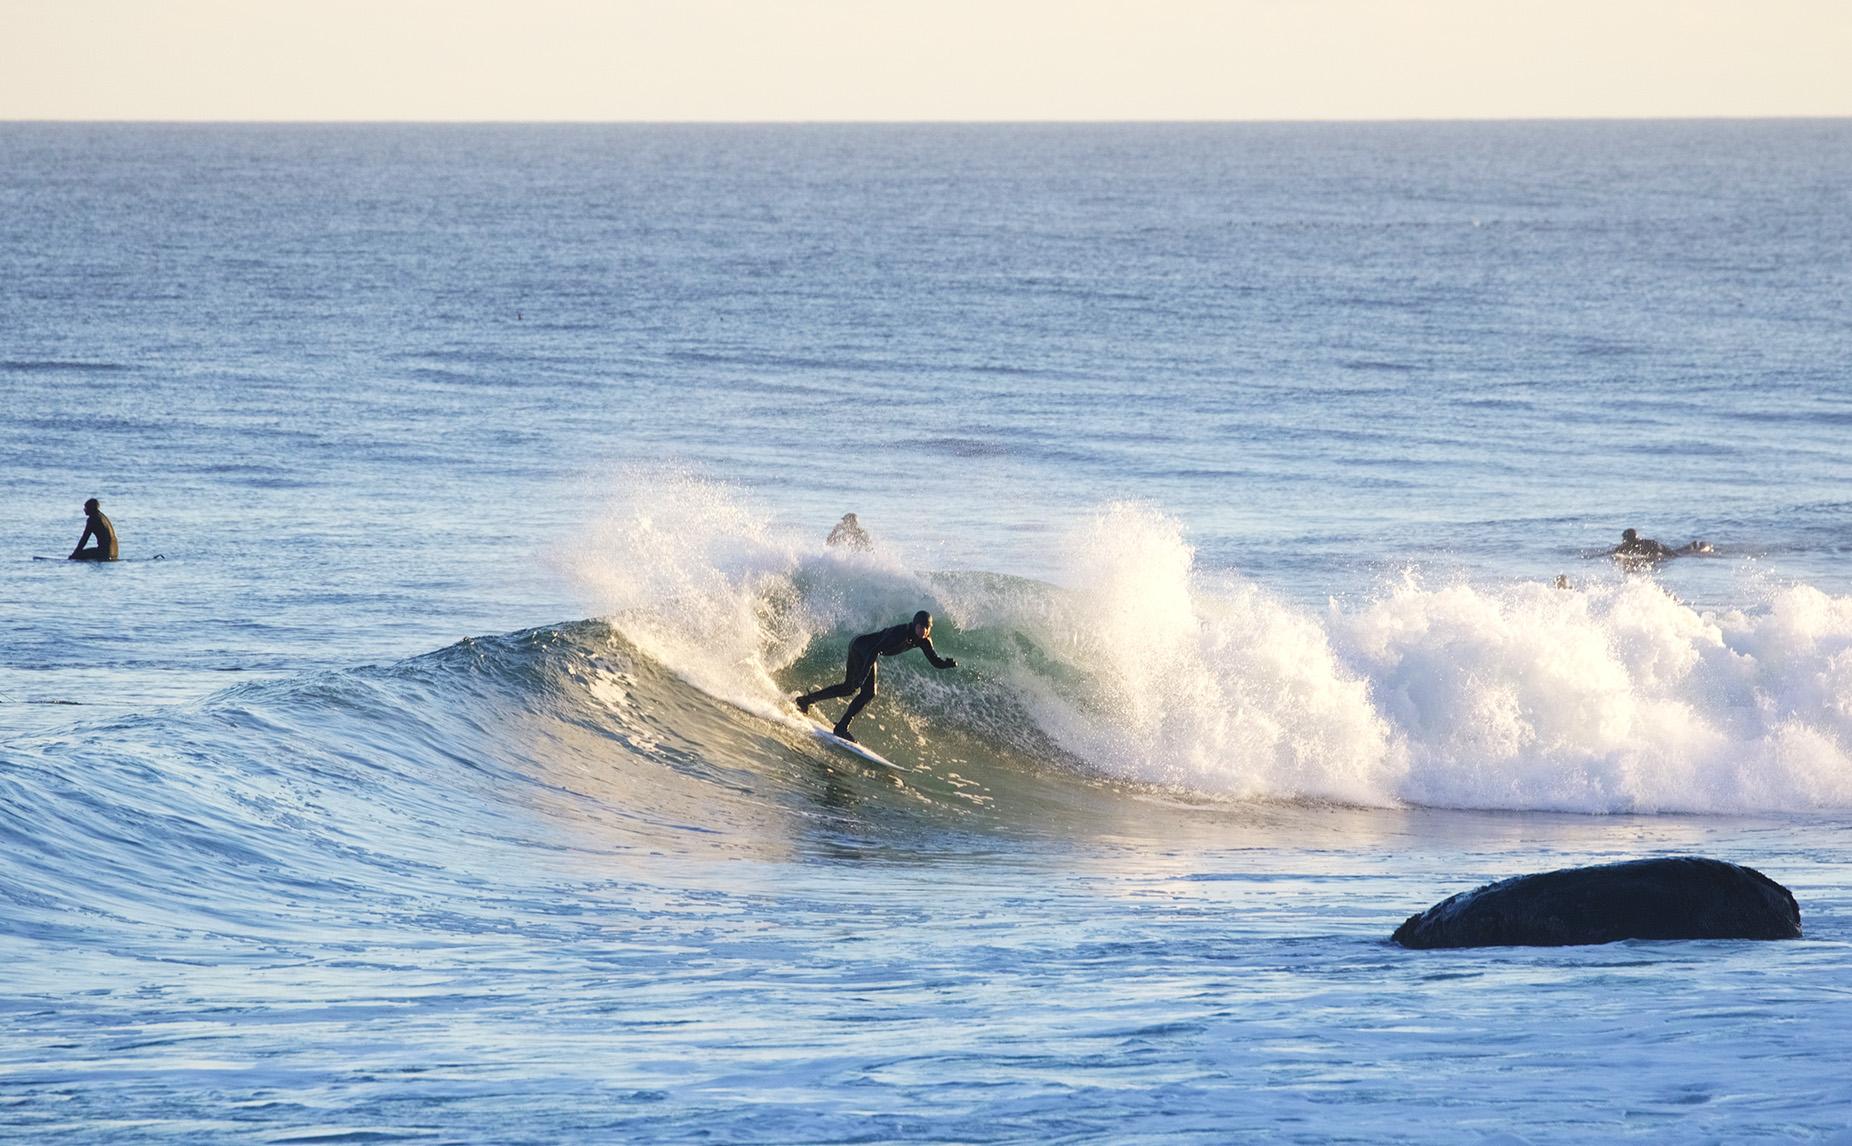 1-19-17 MTK Surfer 13.jpg